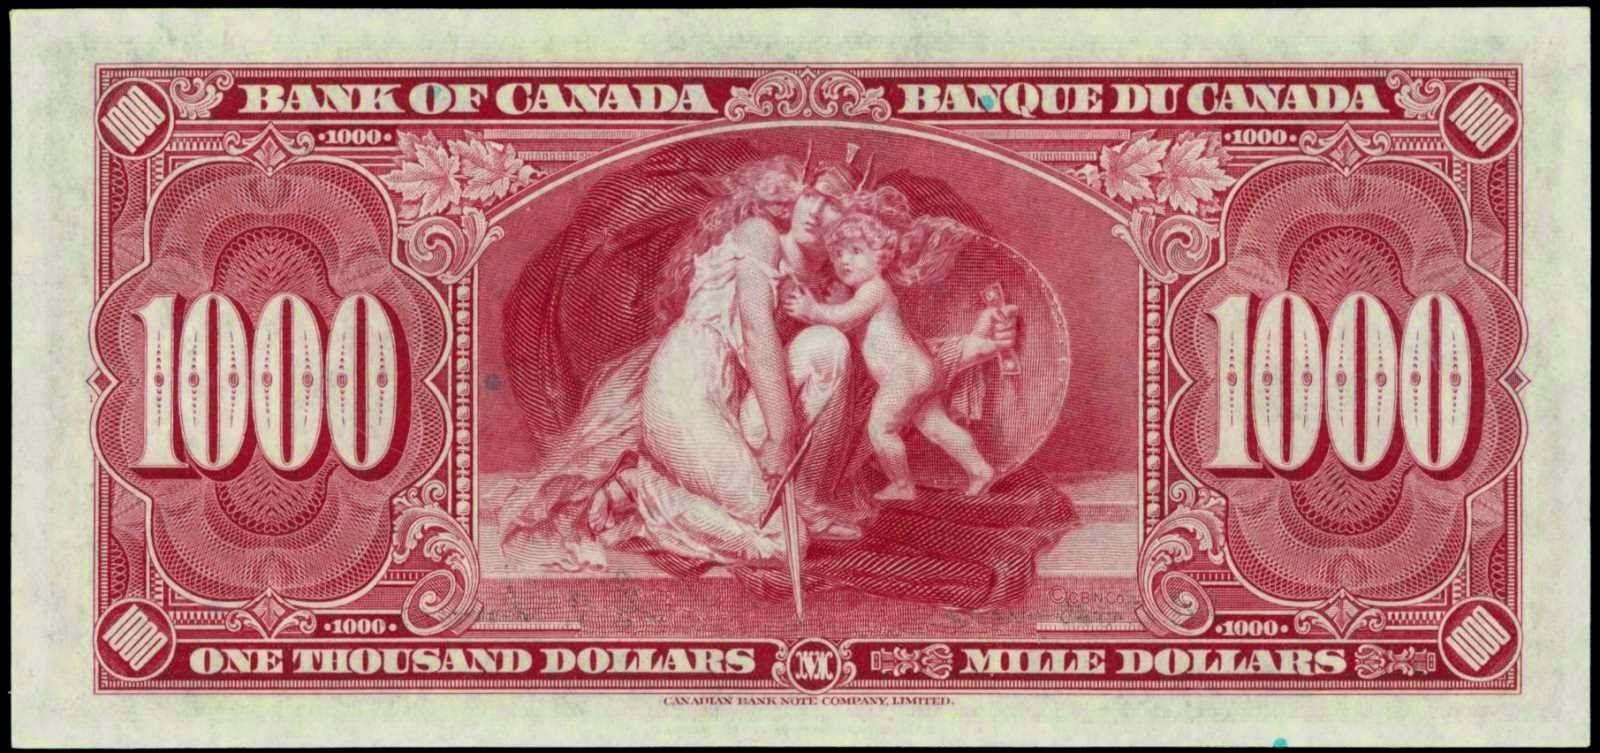 Bank Of Canada 1000 Dollars 1937 Thousand Dollar Bill Canadian Money Canadian Coins